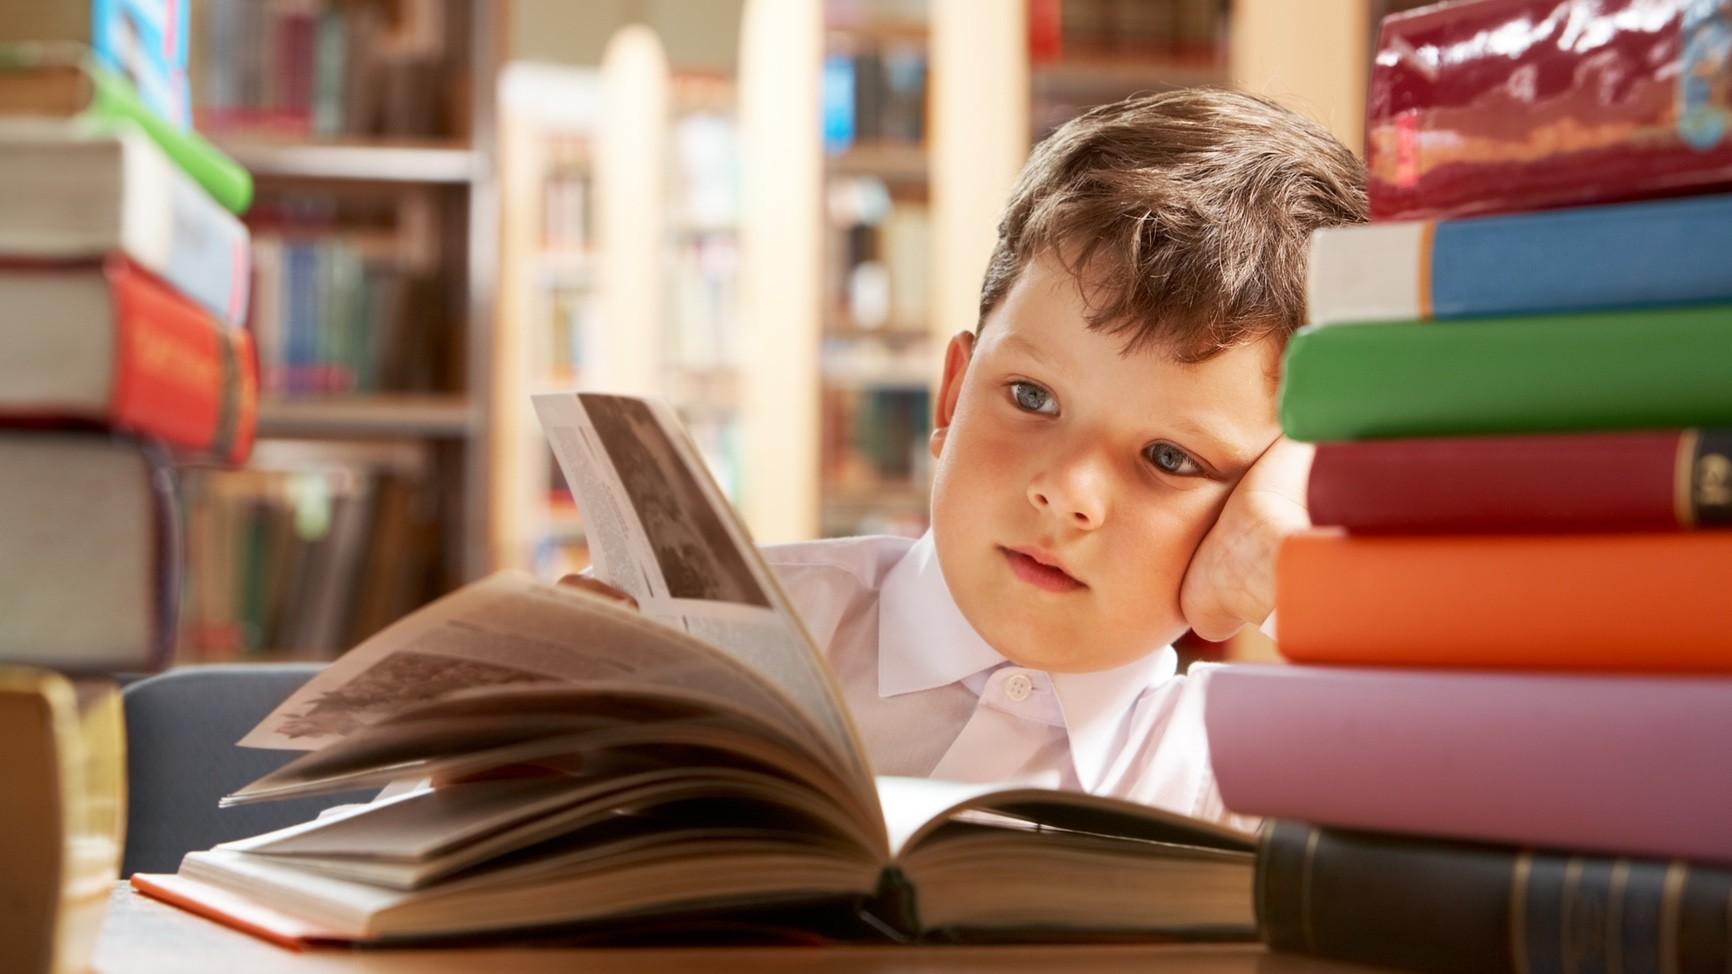 Дети с учебником картинки